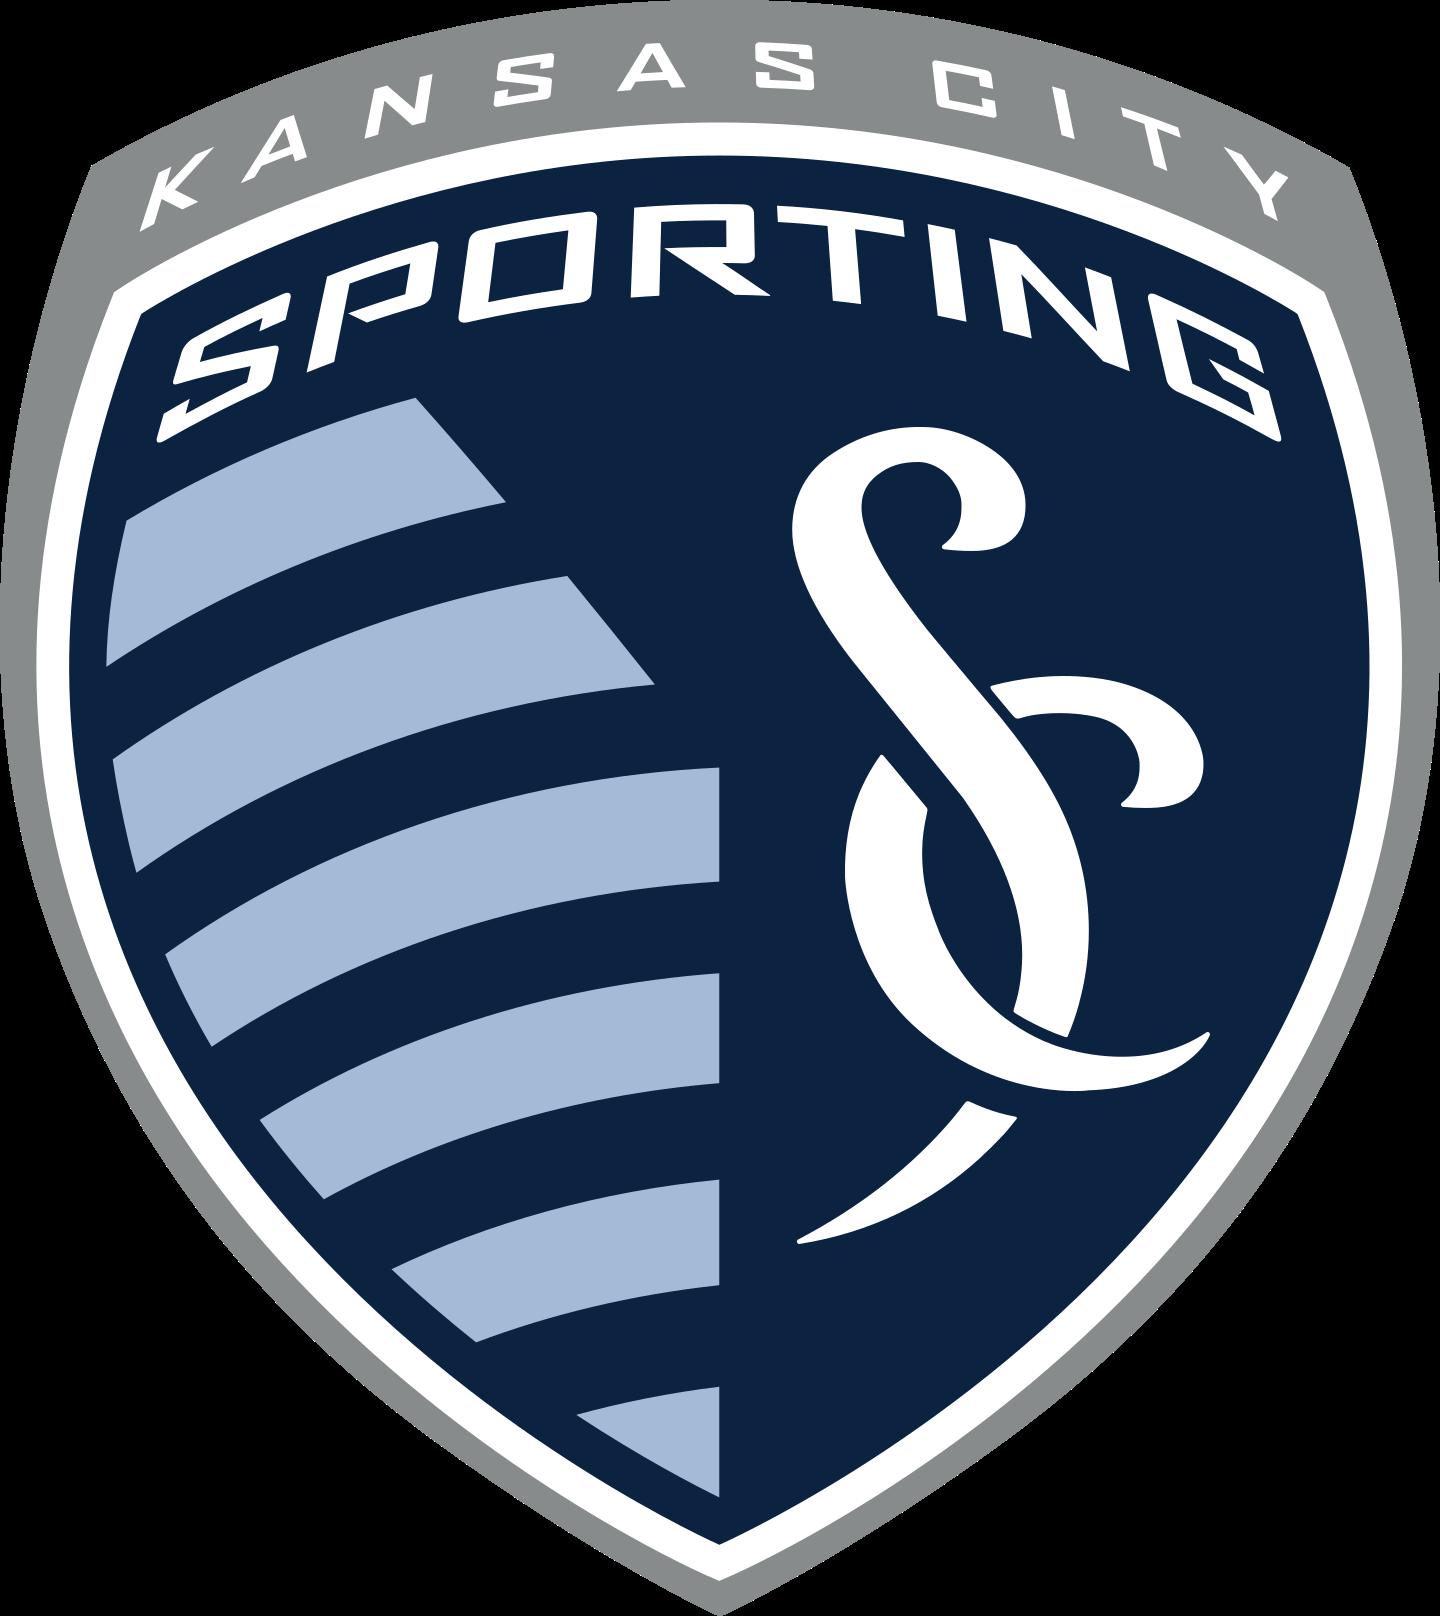 sporting kansas city logo 2 - Sporting Kansas City Logo